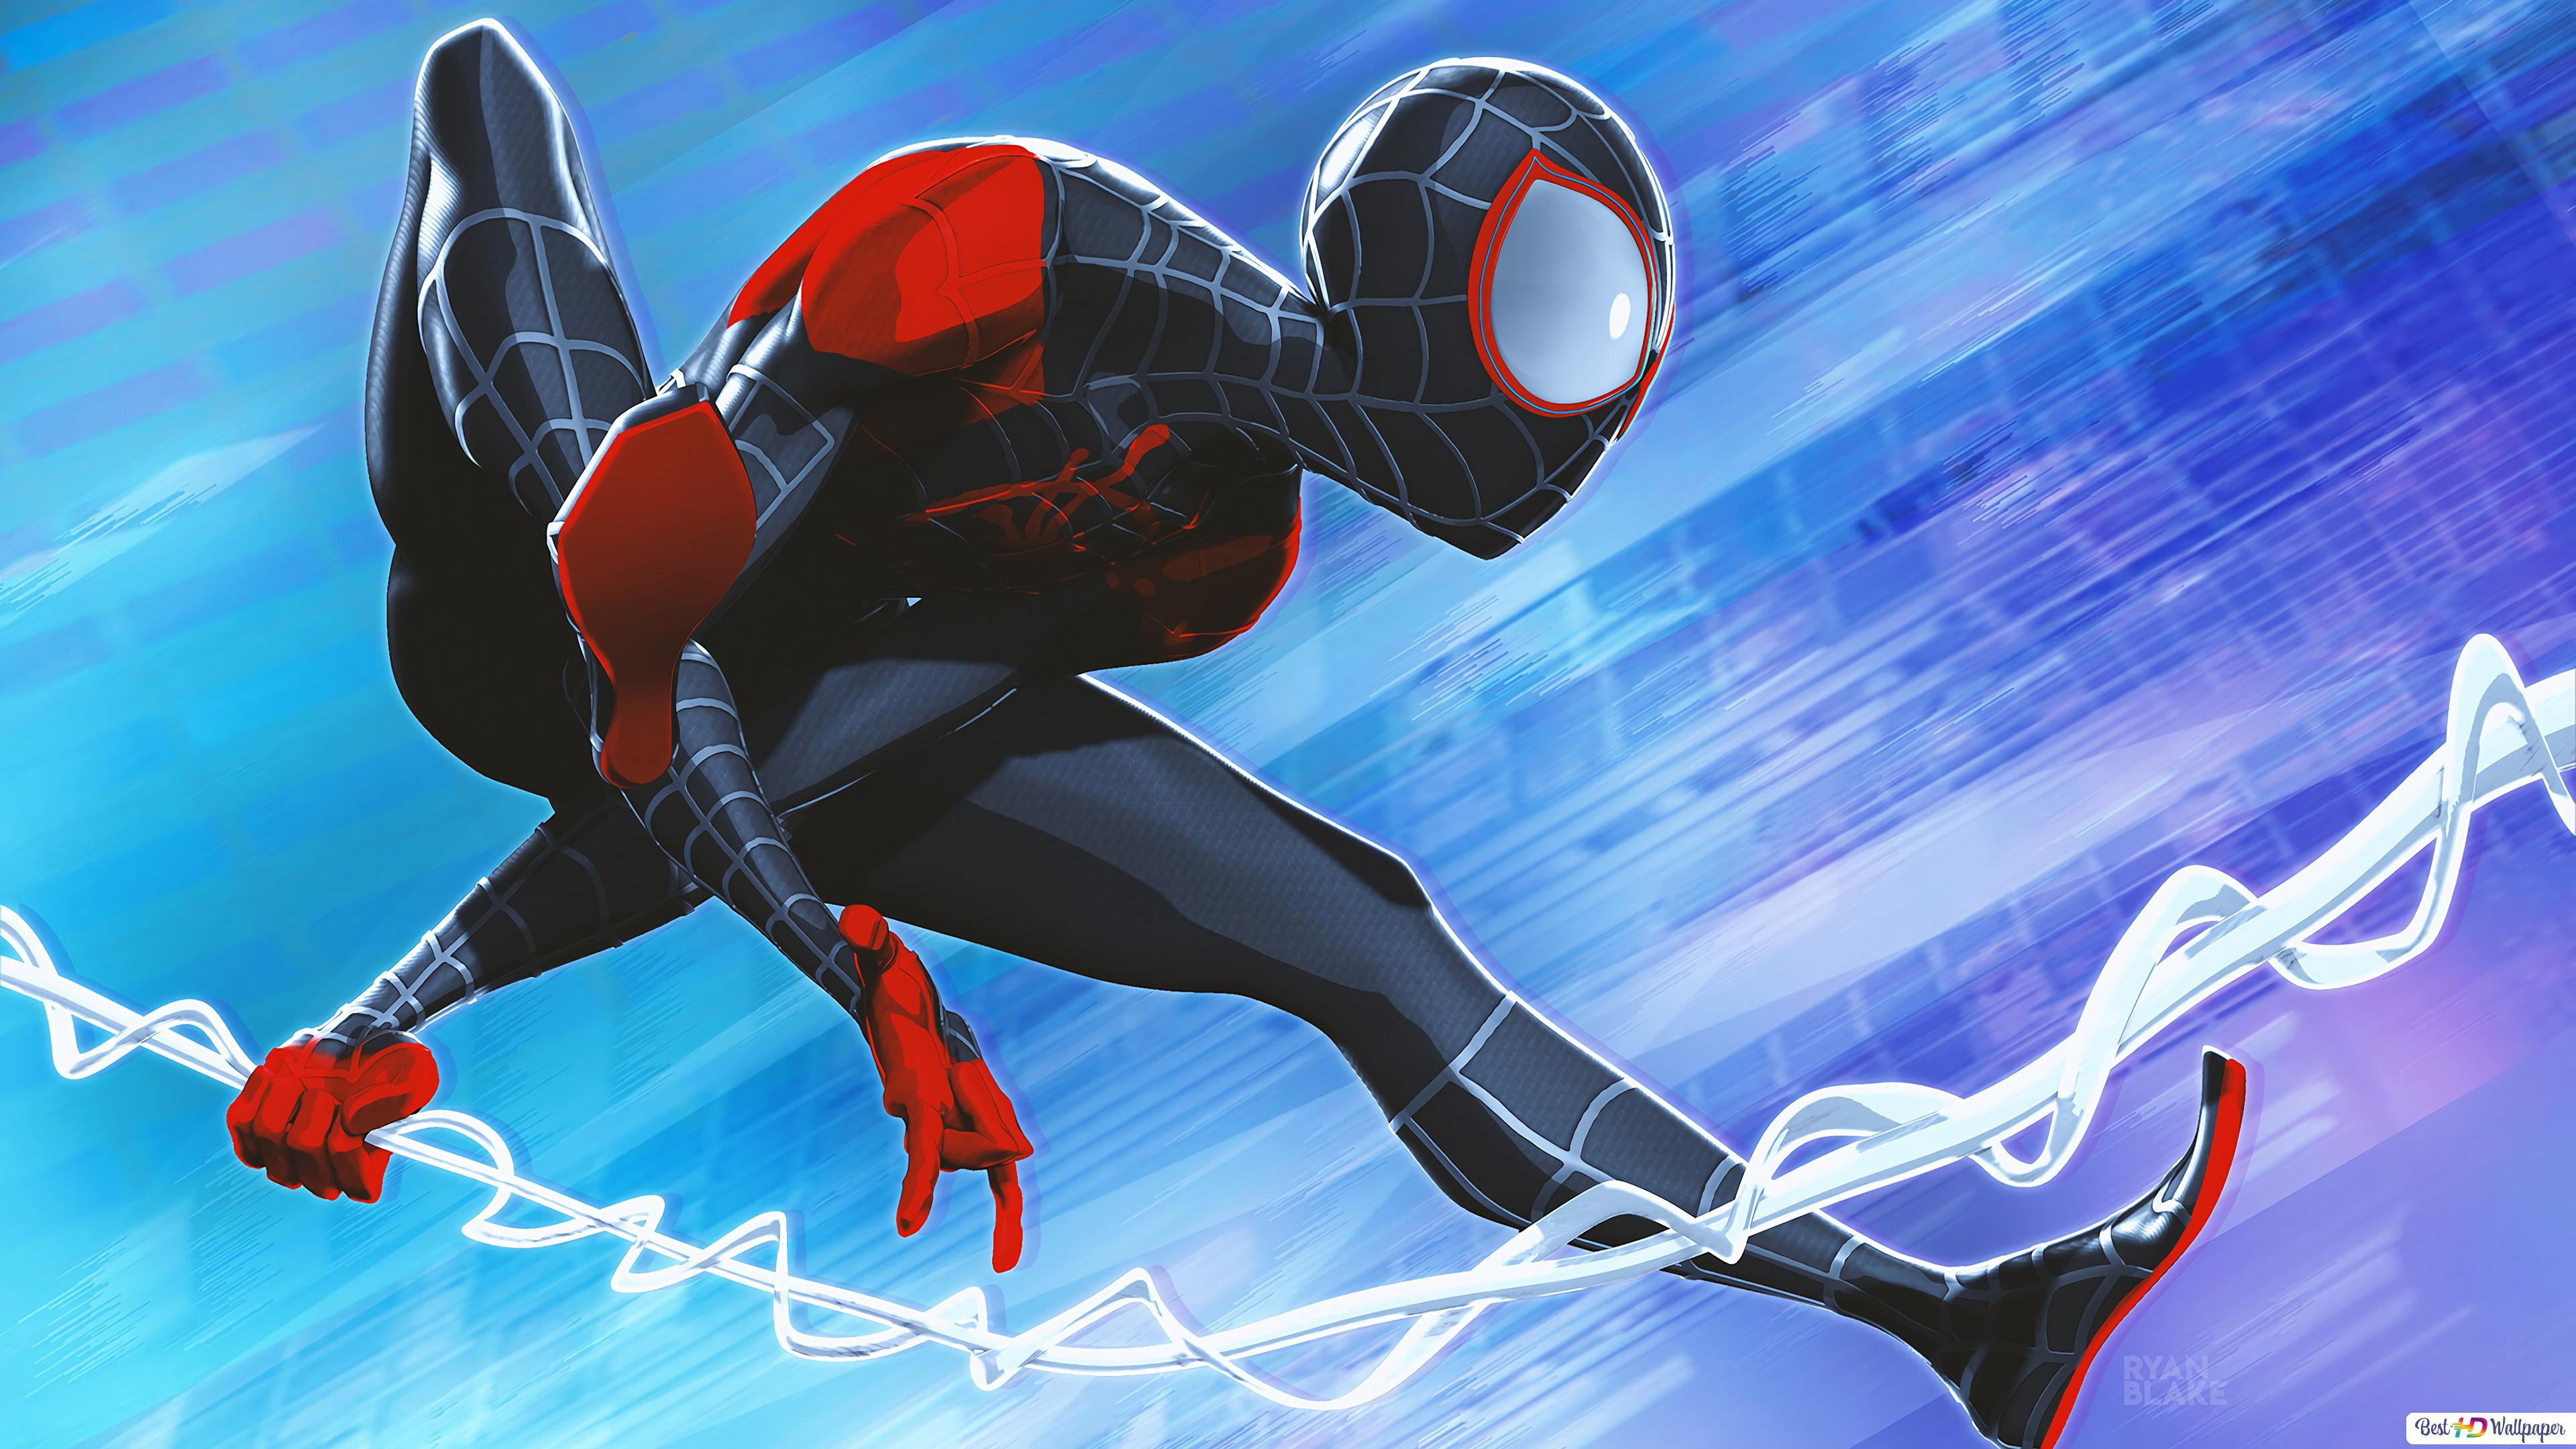 Spider Man Miles Morales Hd Wallpaper Download